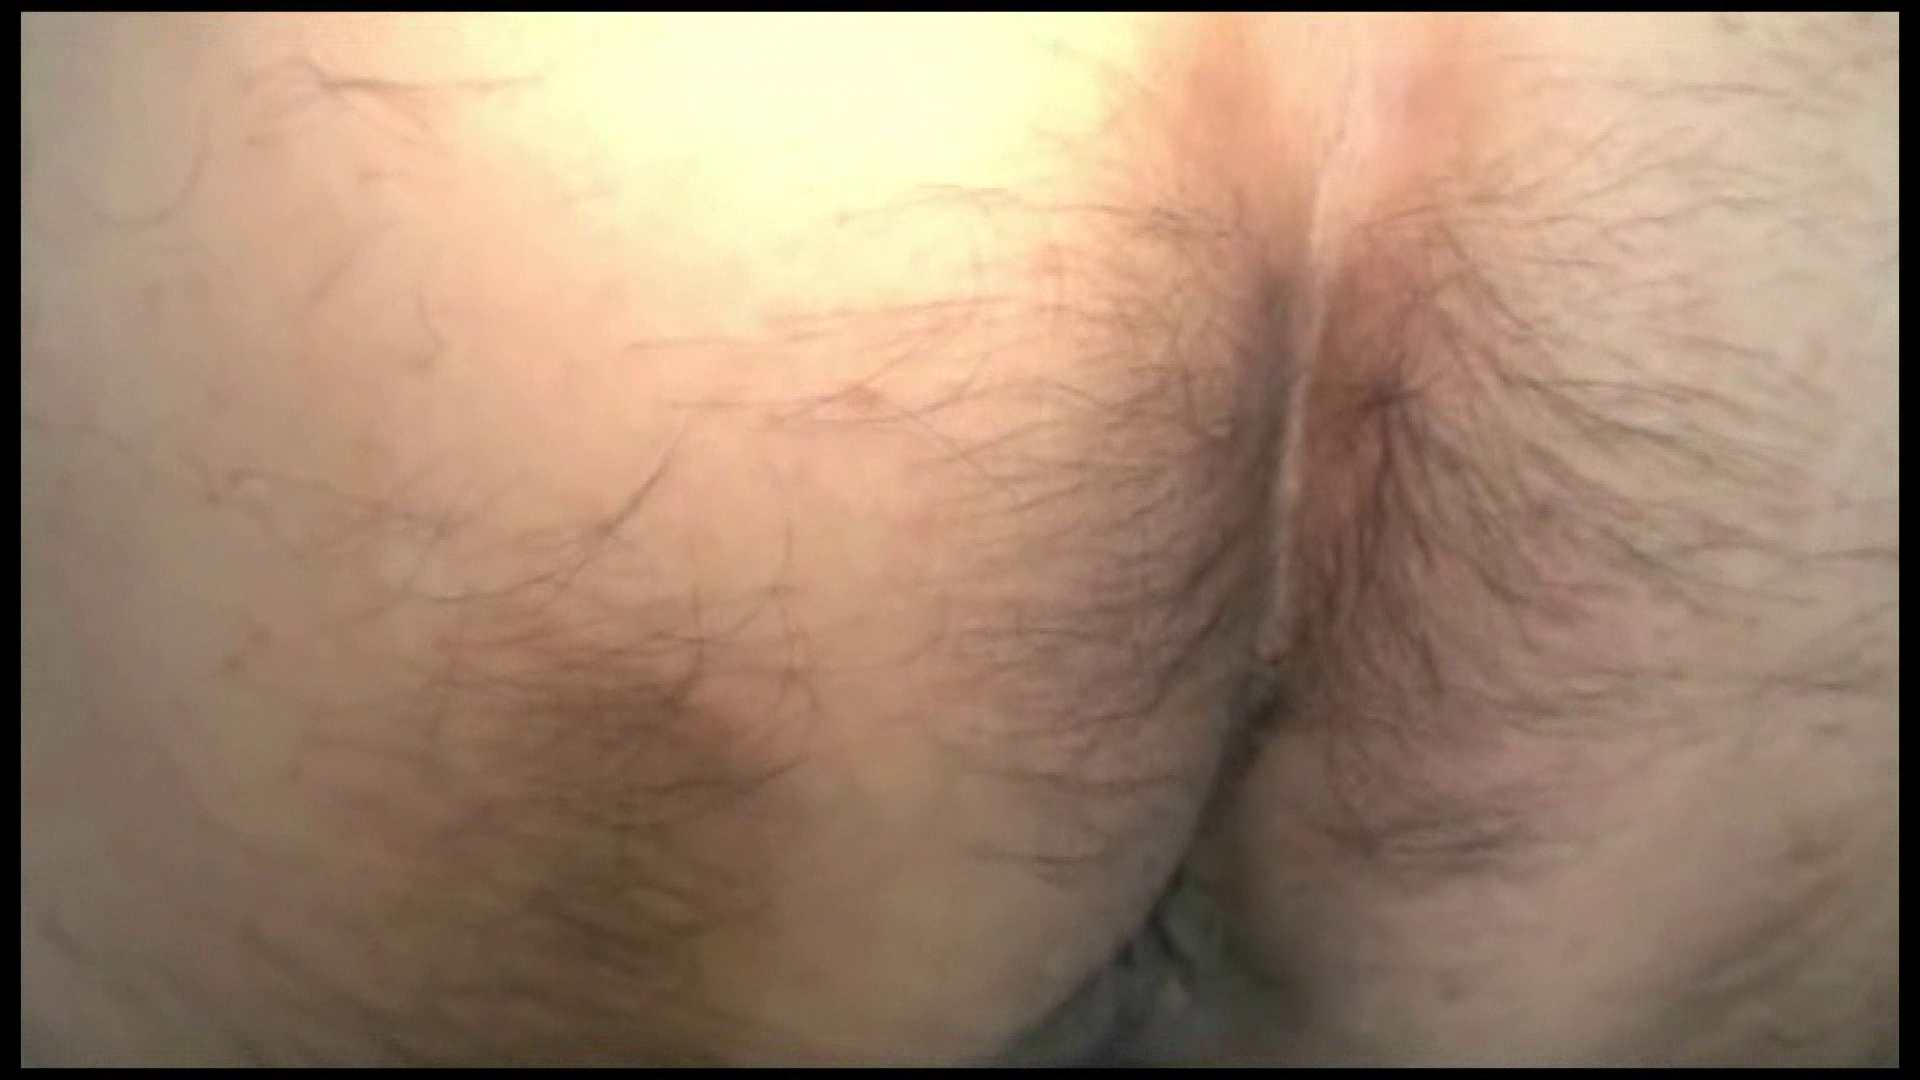 ハメ撮り天国 Vol.10 後編 OL裸体 | 流出作品  89画像 89